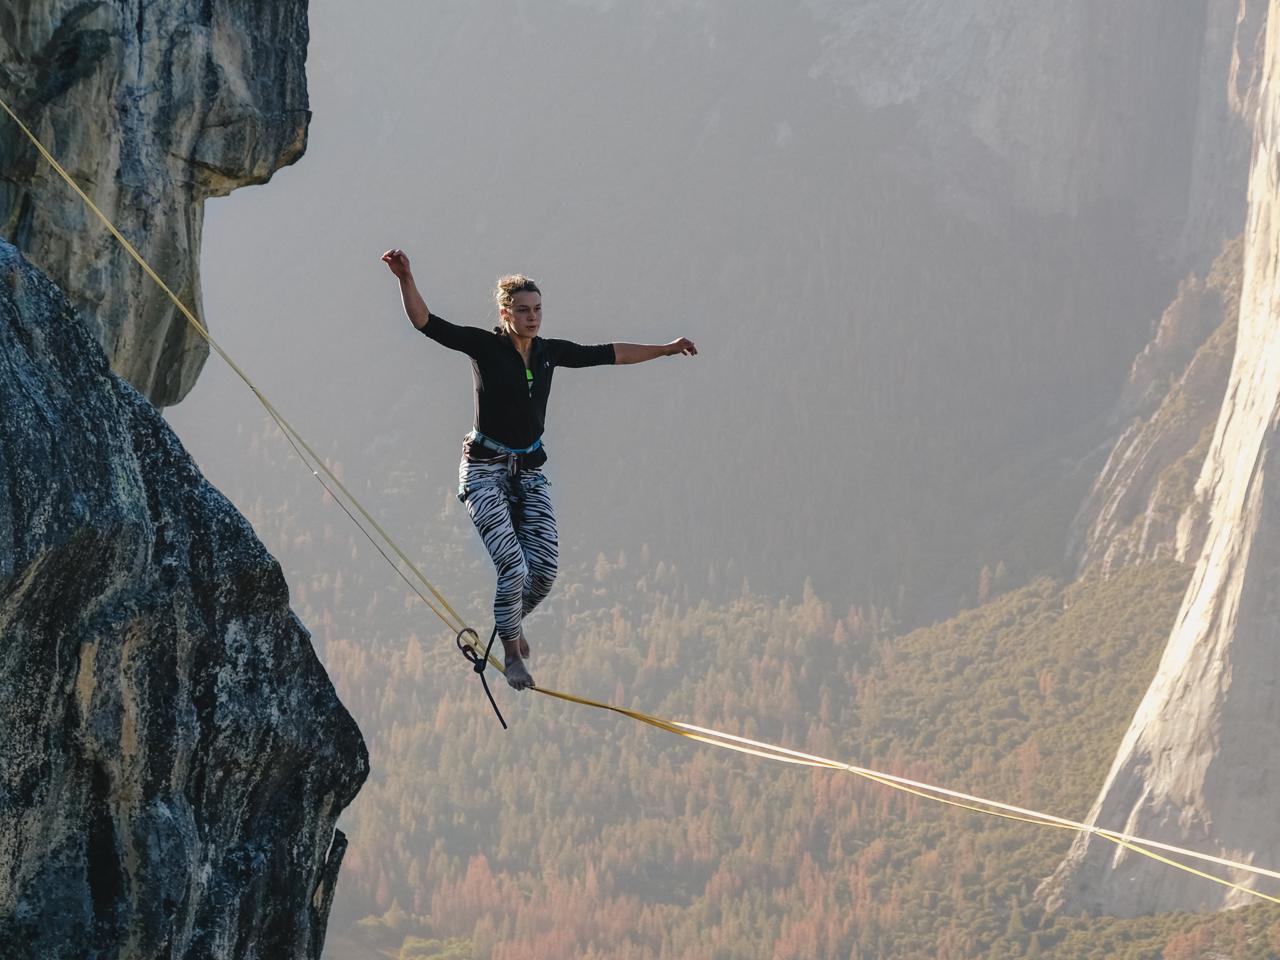 http://www.trendymood.com/wp-content/uploads/2017/11/Slackline-Yosemite-1280x960.png